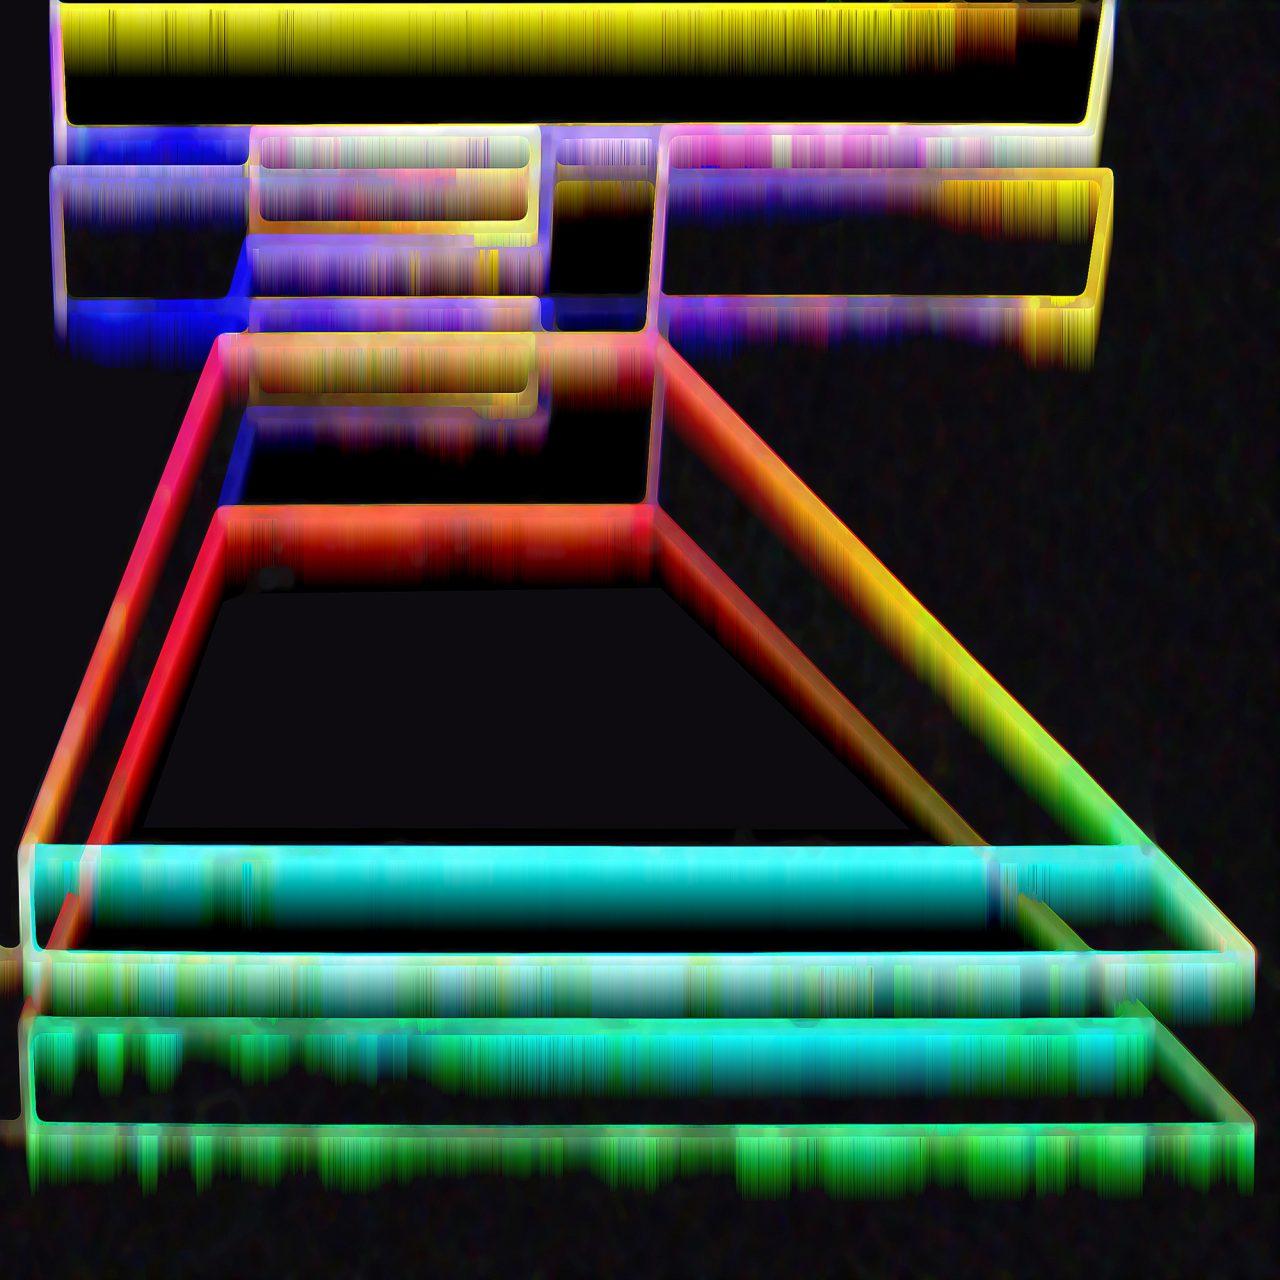 Raumordnung, aus der Reihe Bildcode, Experimental_Fine_Art_Photography, 2017, Colorpigment on Aludibond, Diasec, 20 x 20 cm